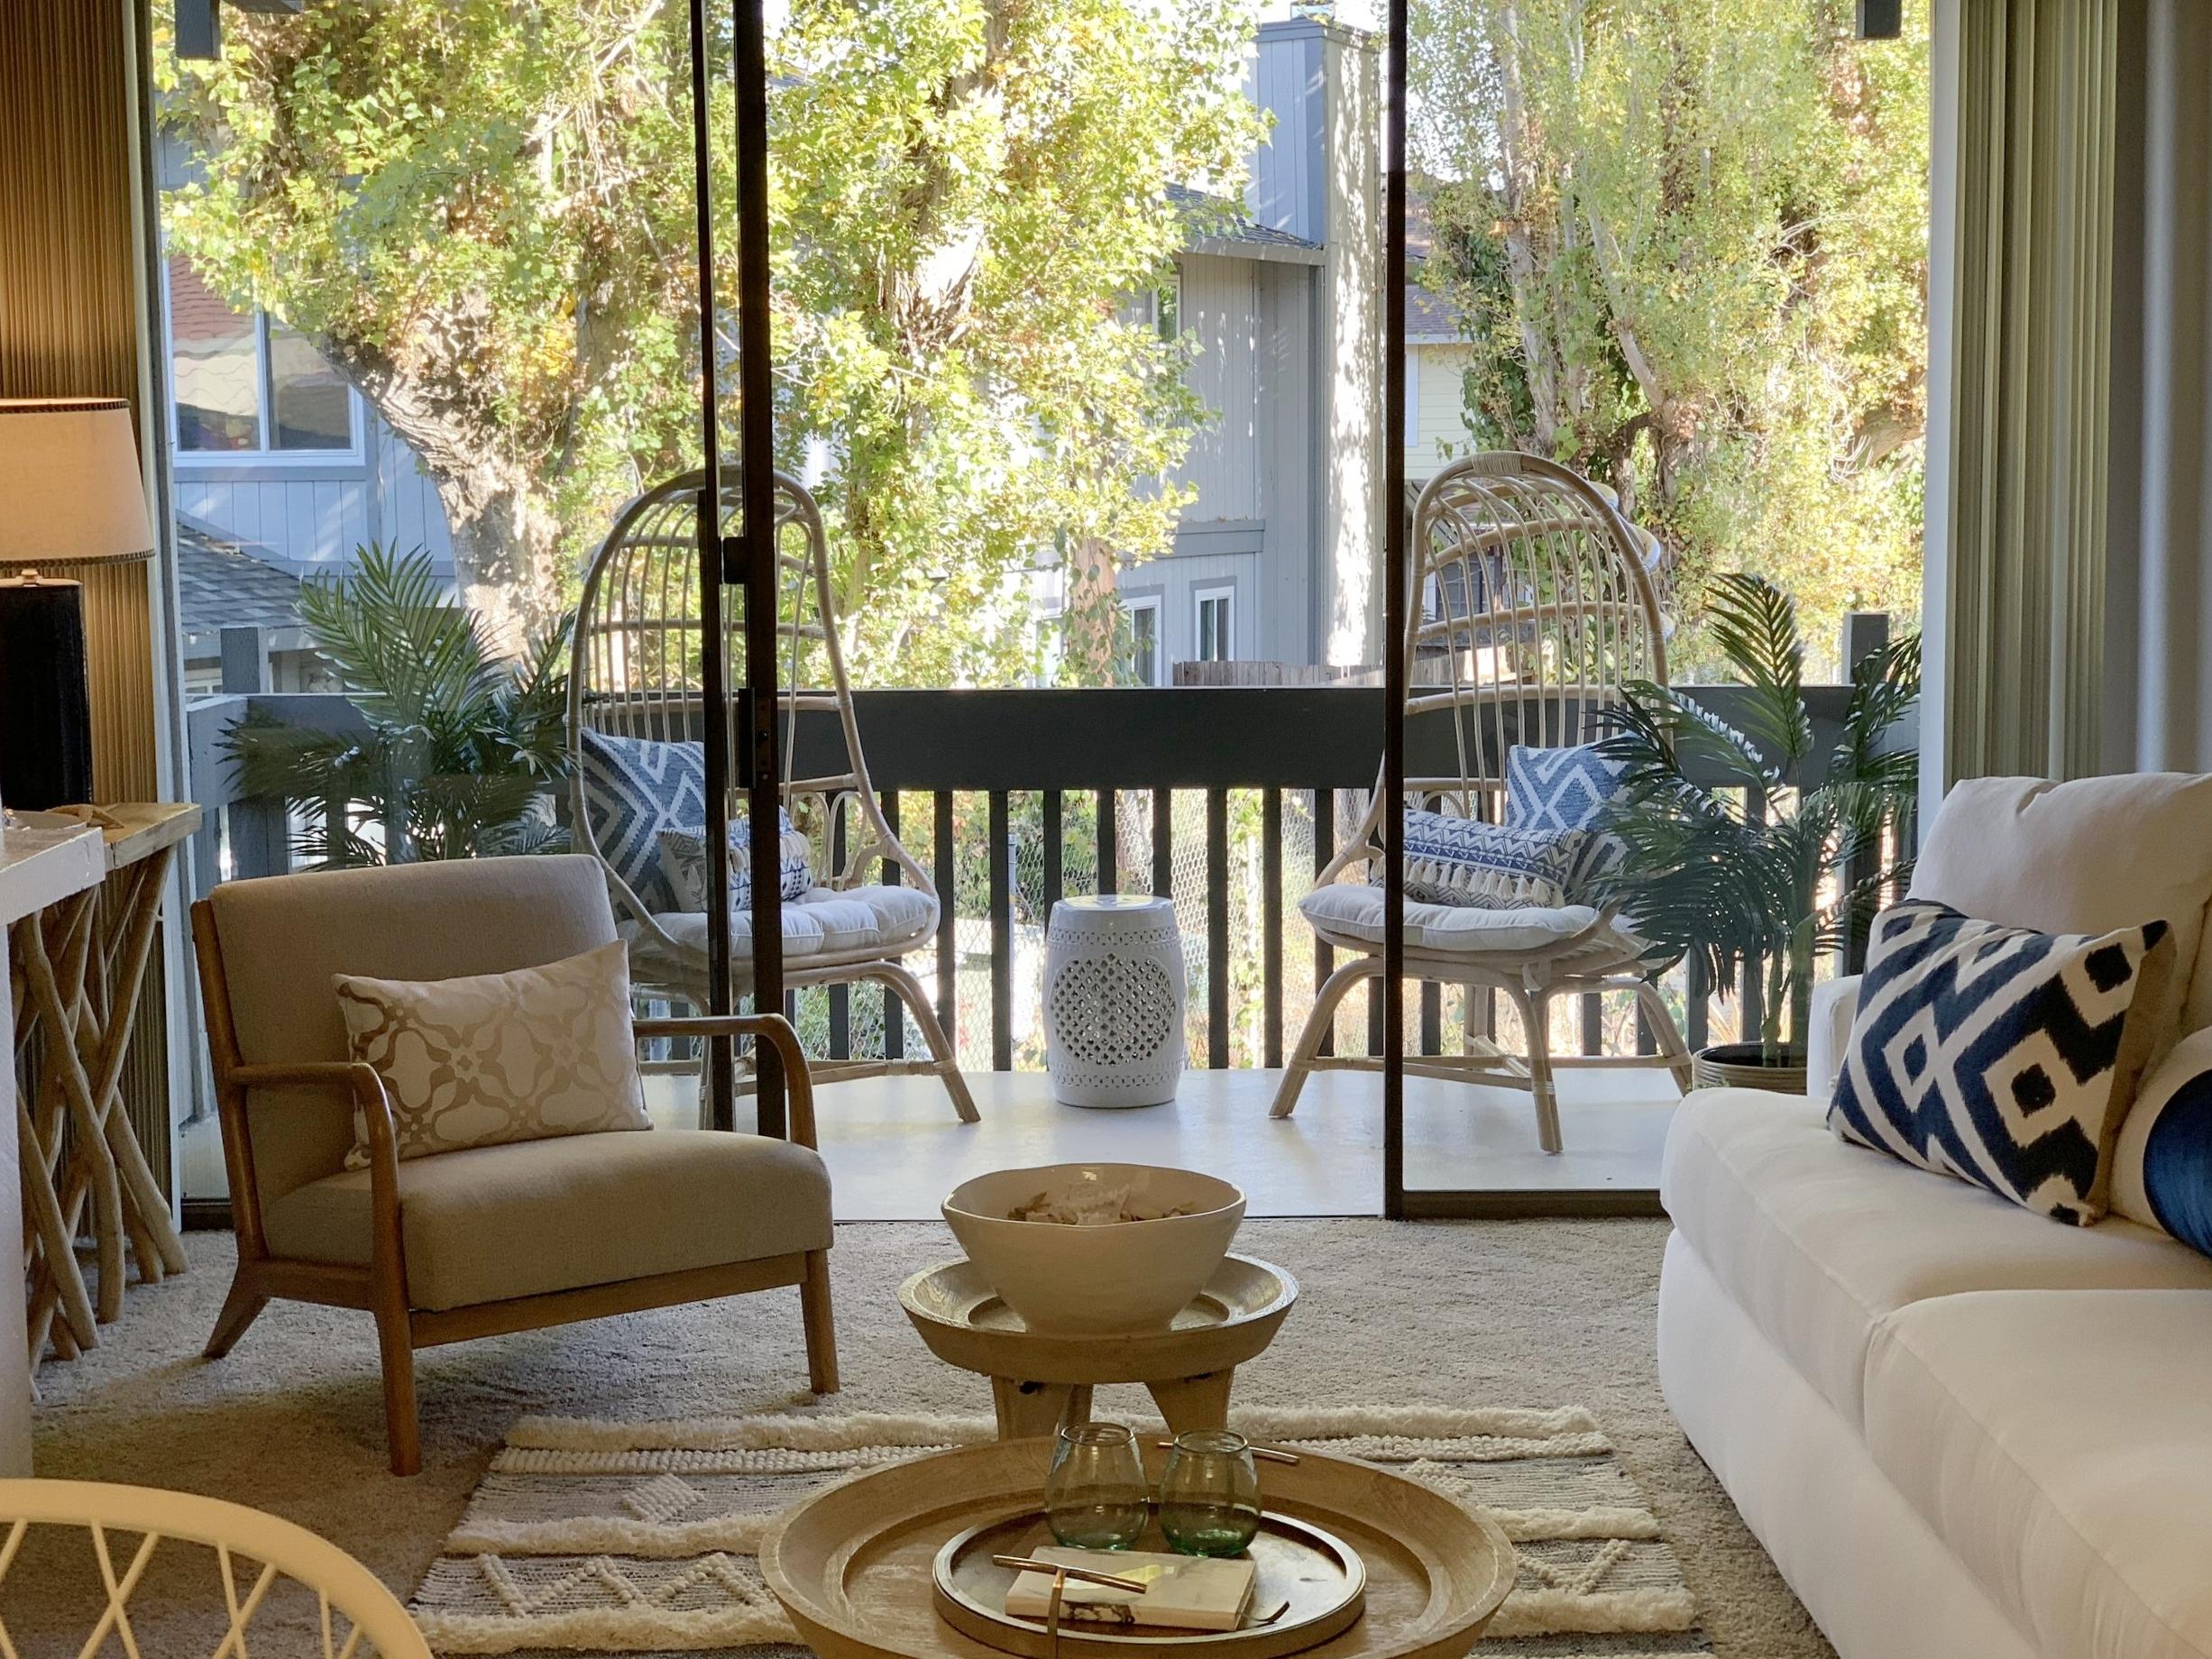 Bright, spacious living areas